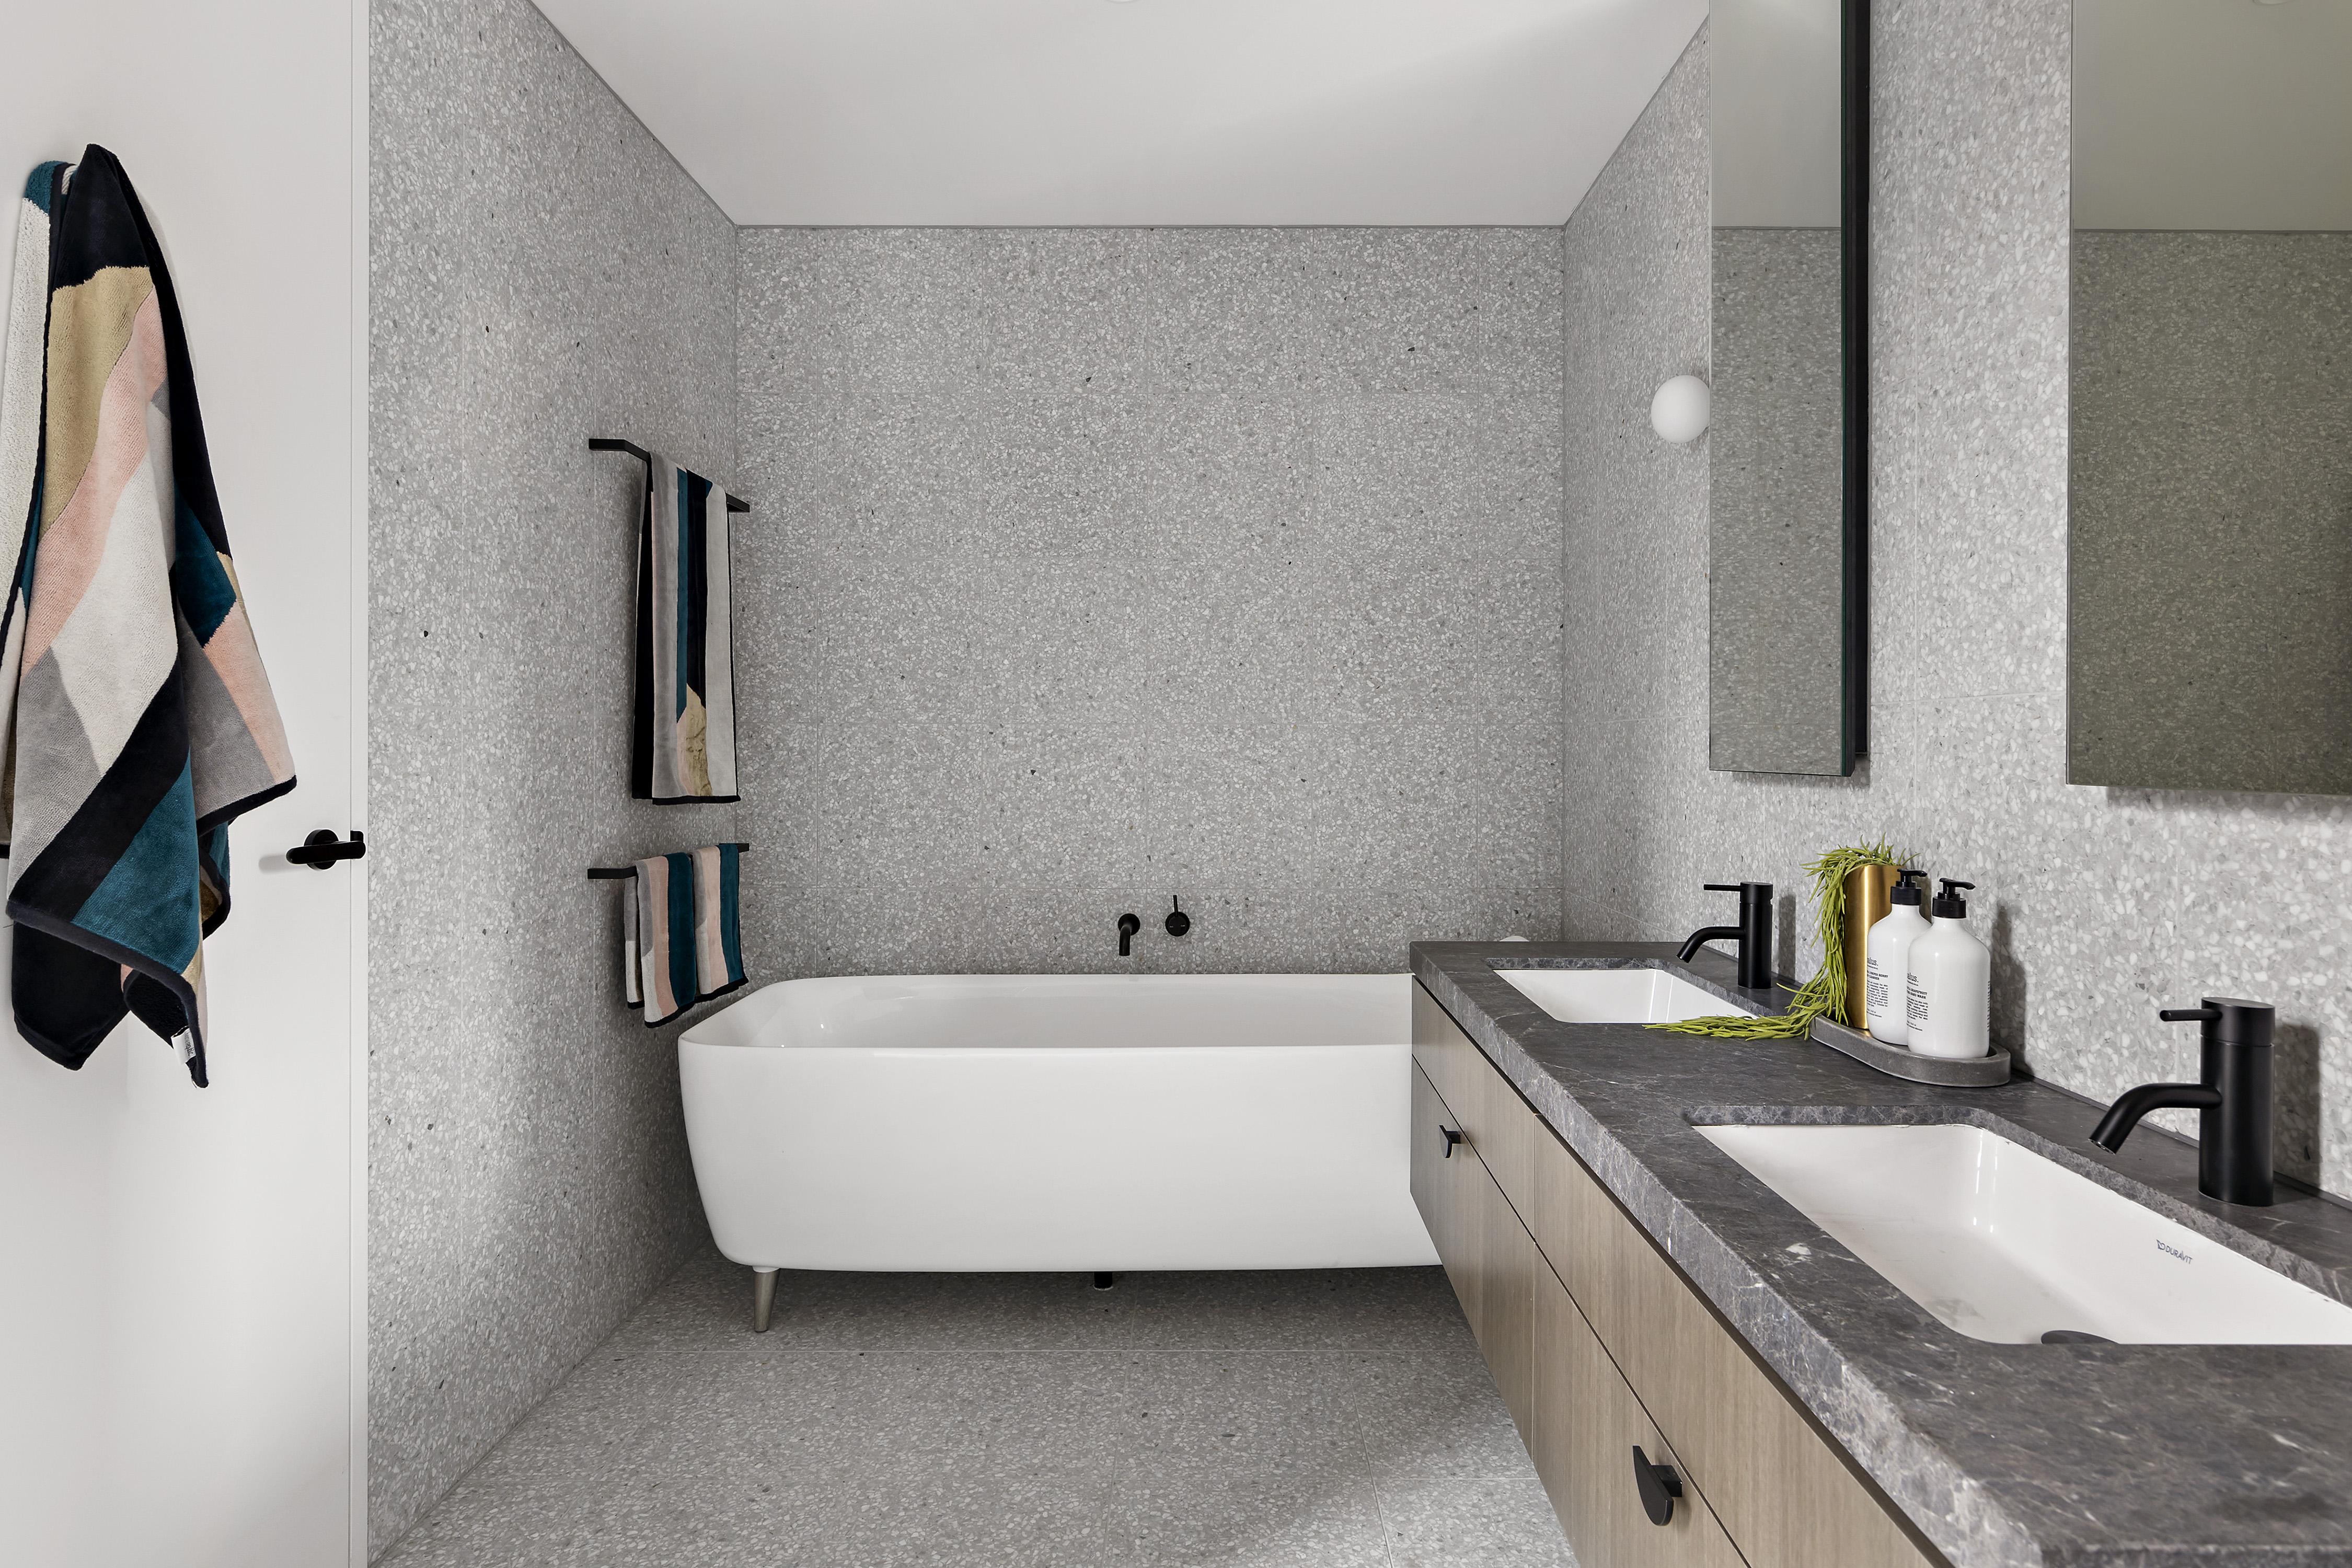 405-9-johnston-street-port-melbourne-student-accommodation-Melbourne-Bathroom-Unilodgers